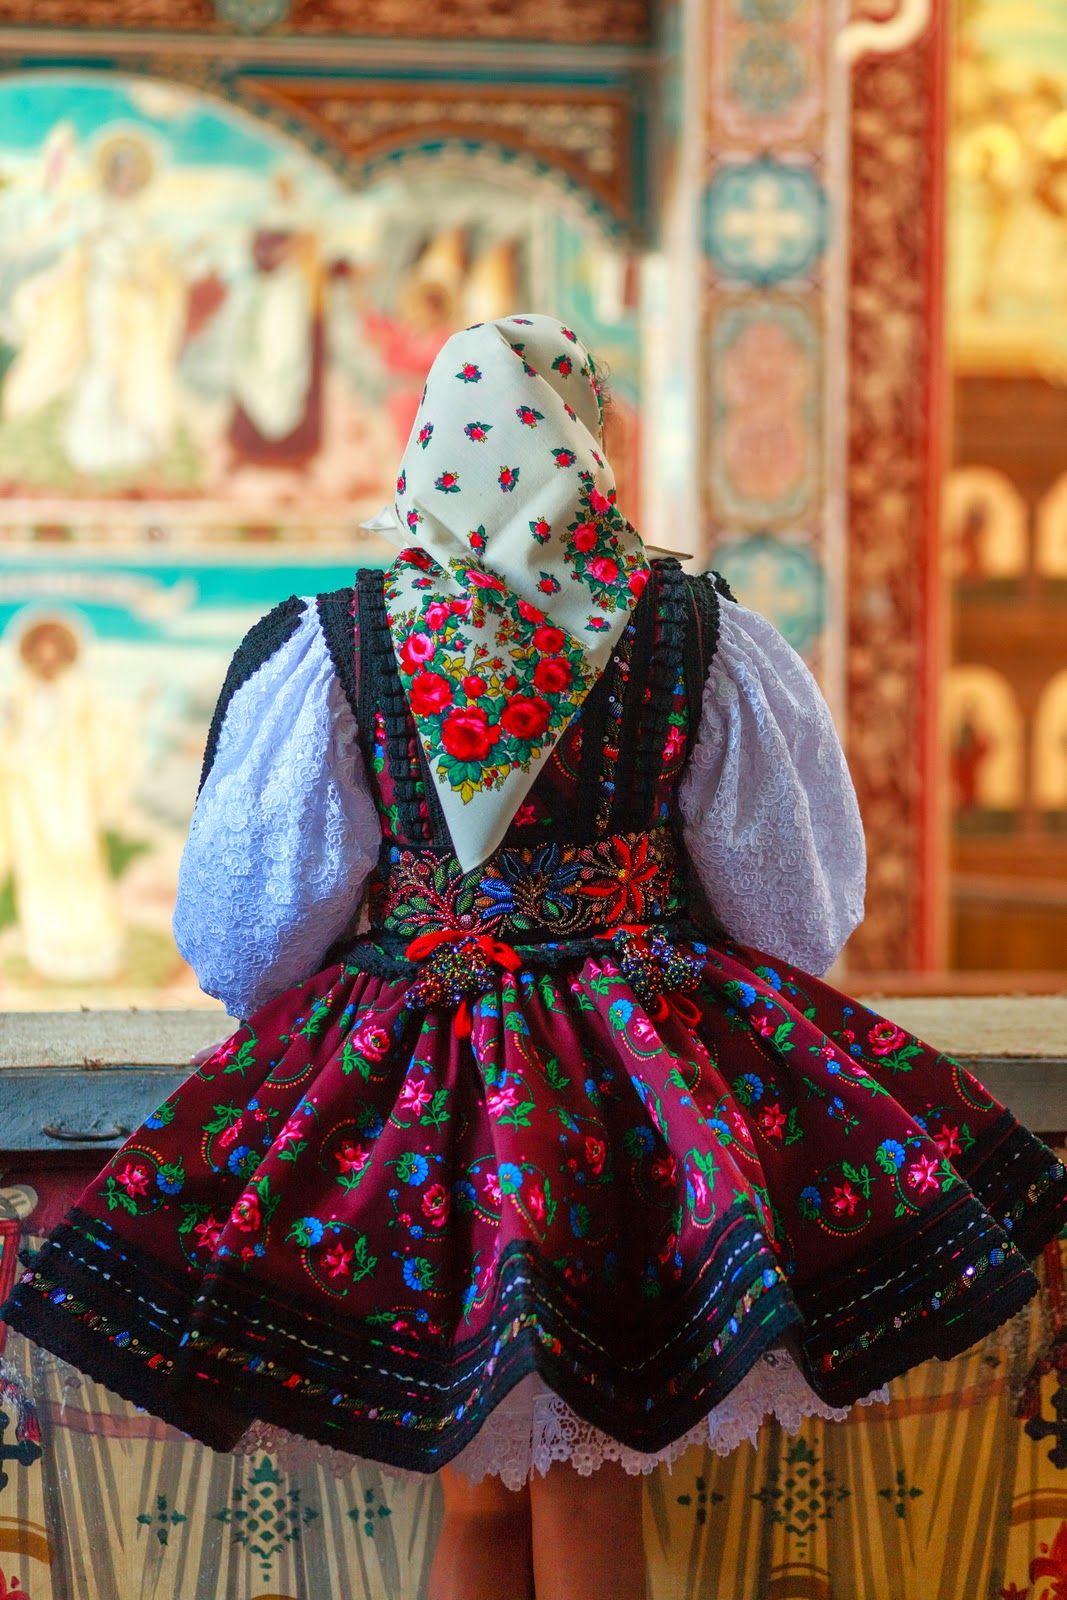 Maramures region traditional costume, Turț, photo Alexandru Feher, www.romaniasfriends.com